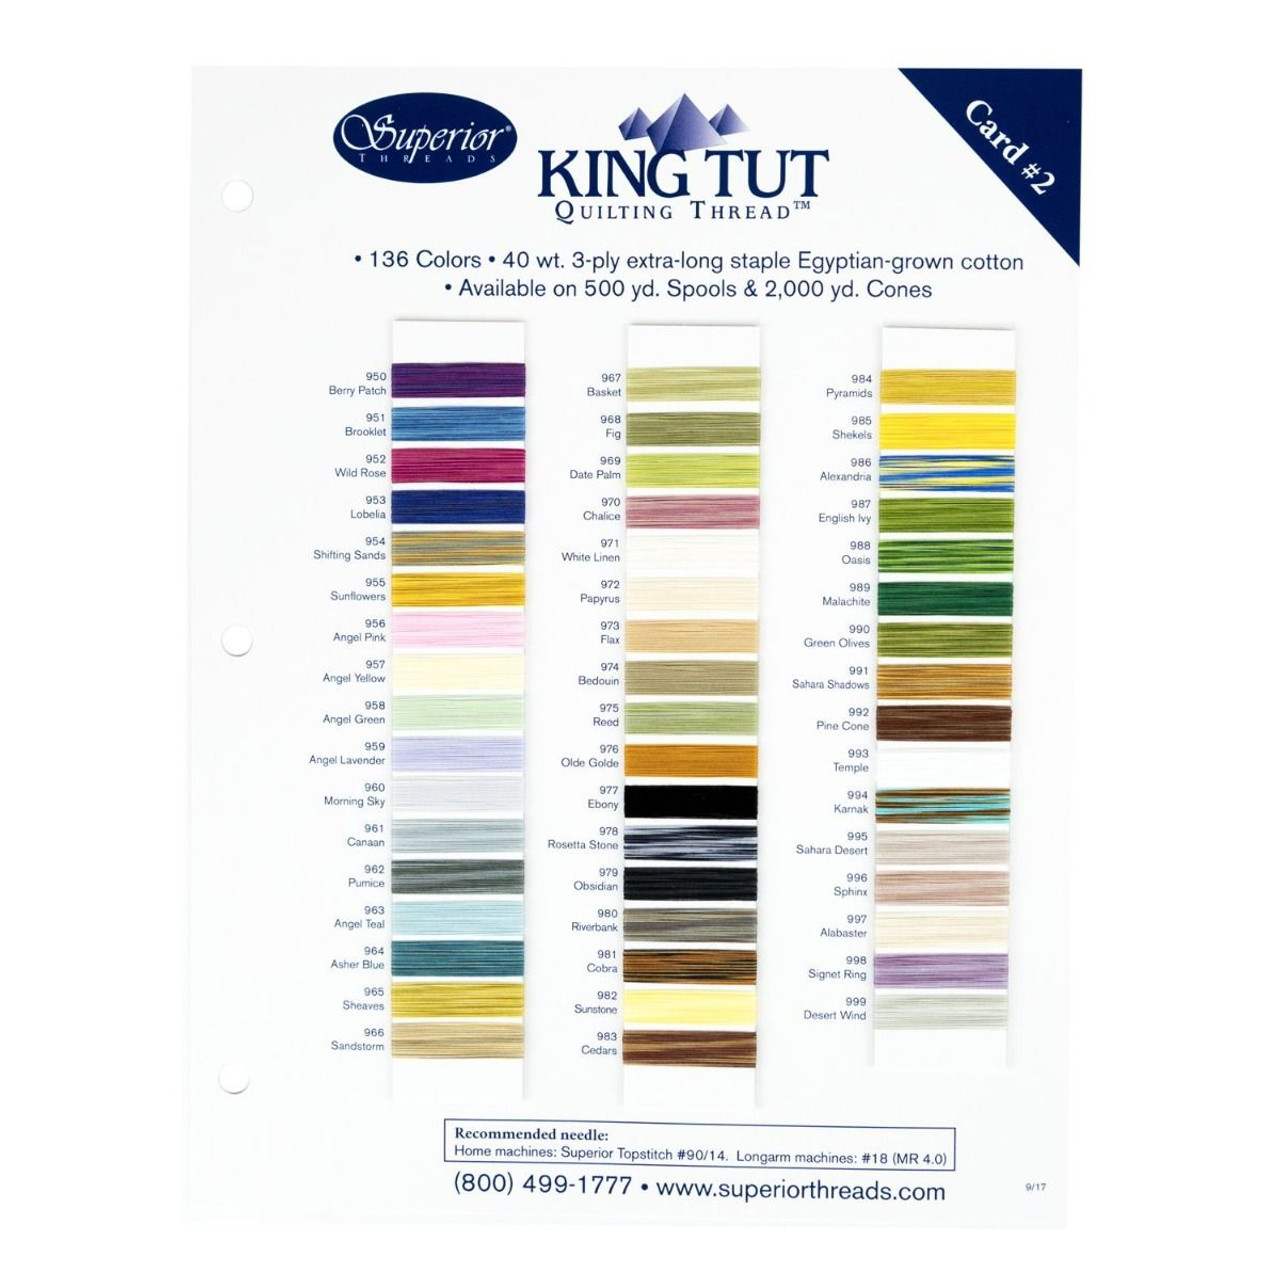 King Tut Cotton Quilting Thread 3-ply 40wt 2000yds Sahara Shadows 991